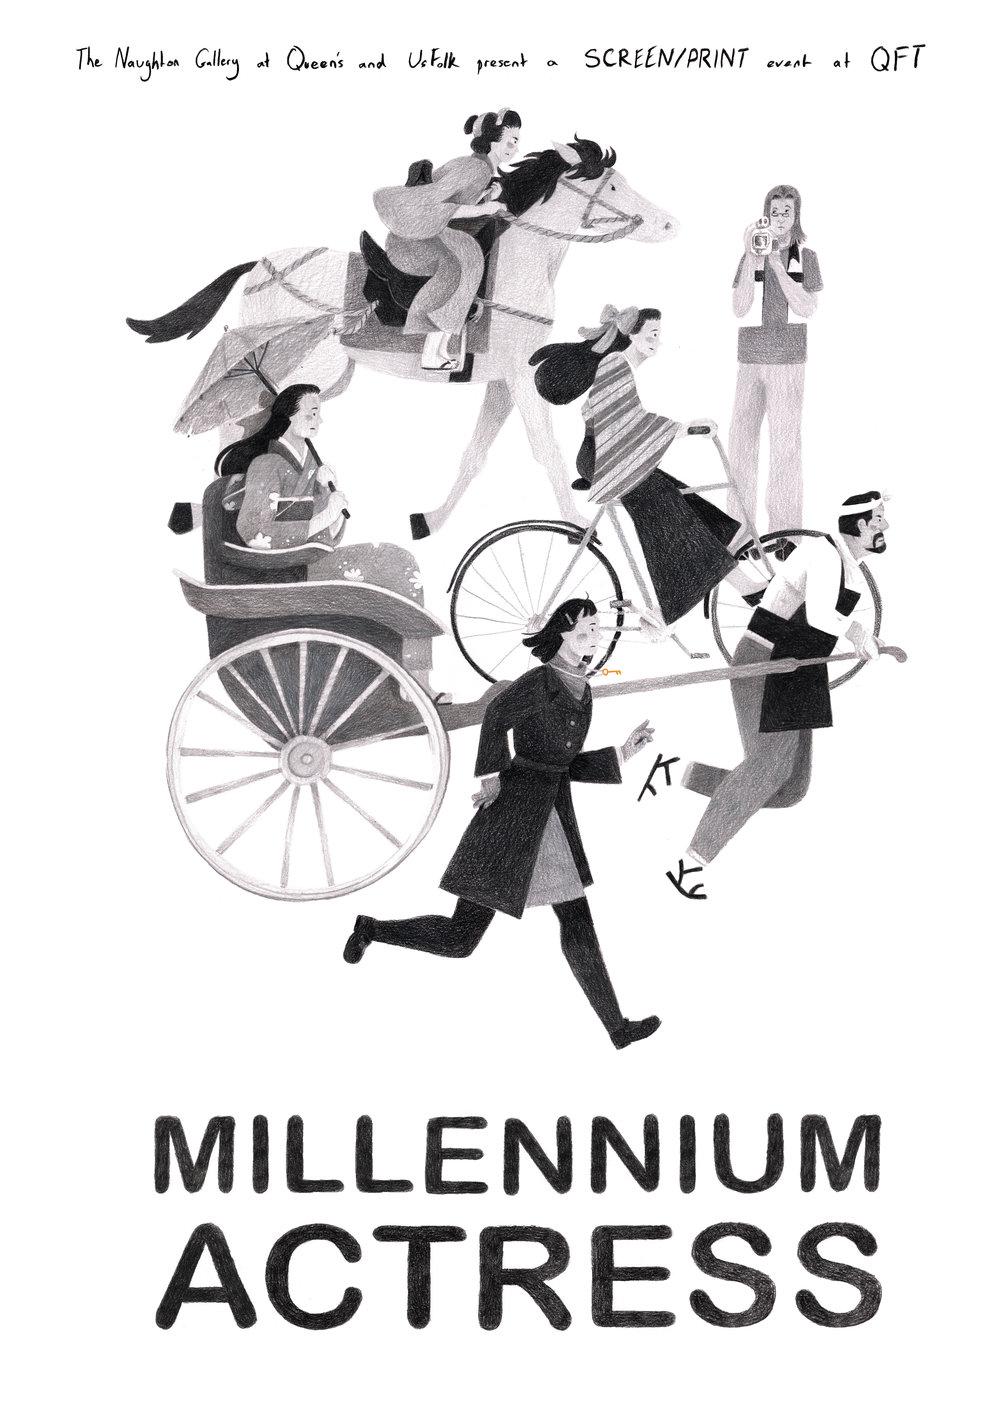 'Millennium Actress' Poster - SCREEN/PRINT Exhibition, Naughton Gallery, 2018